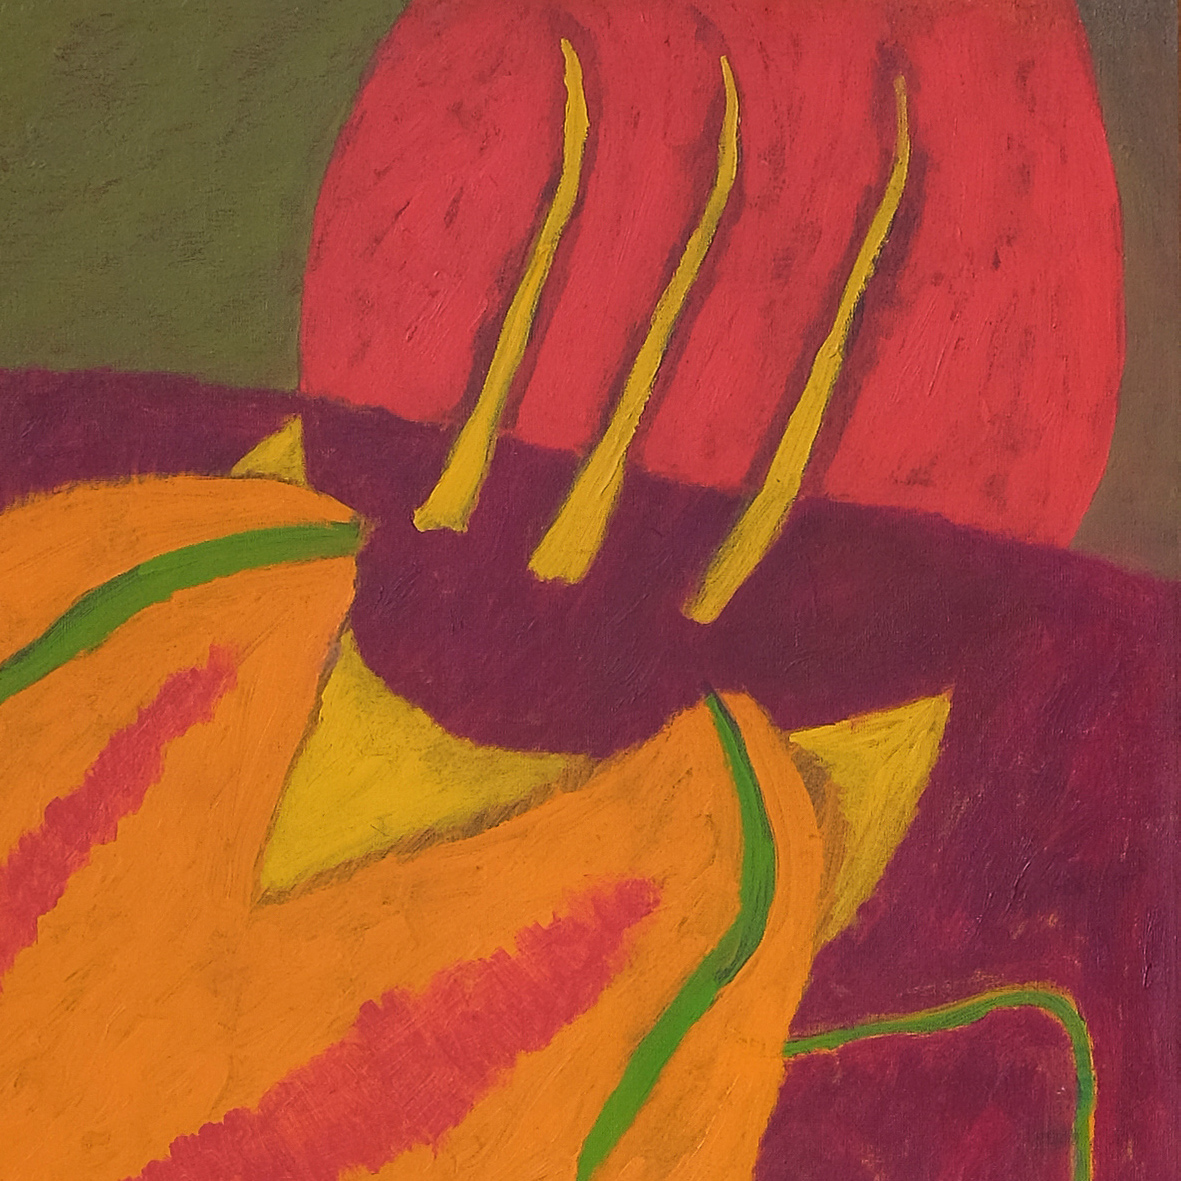 Nashar, Bertumbuh (Growth), oil on canvas, 137 x 88 cm, 1979 (detail)